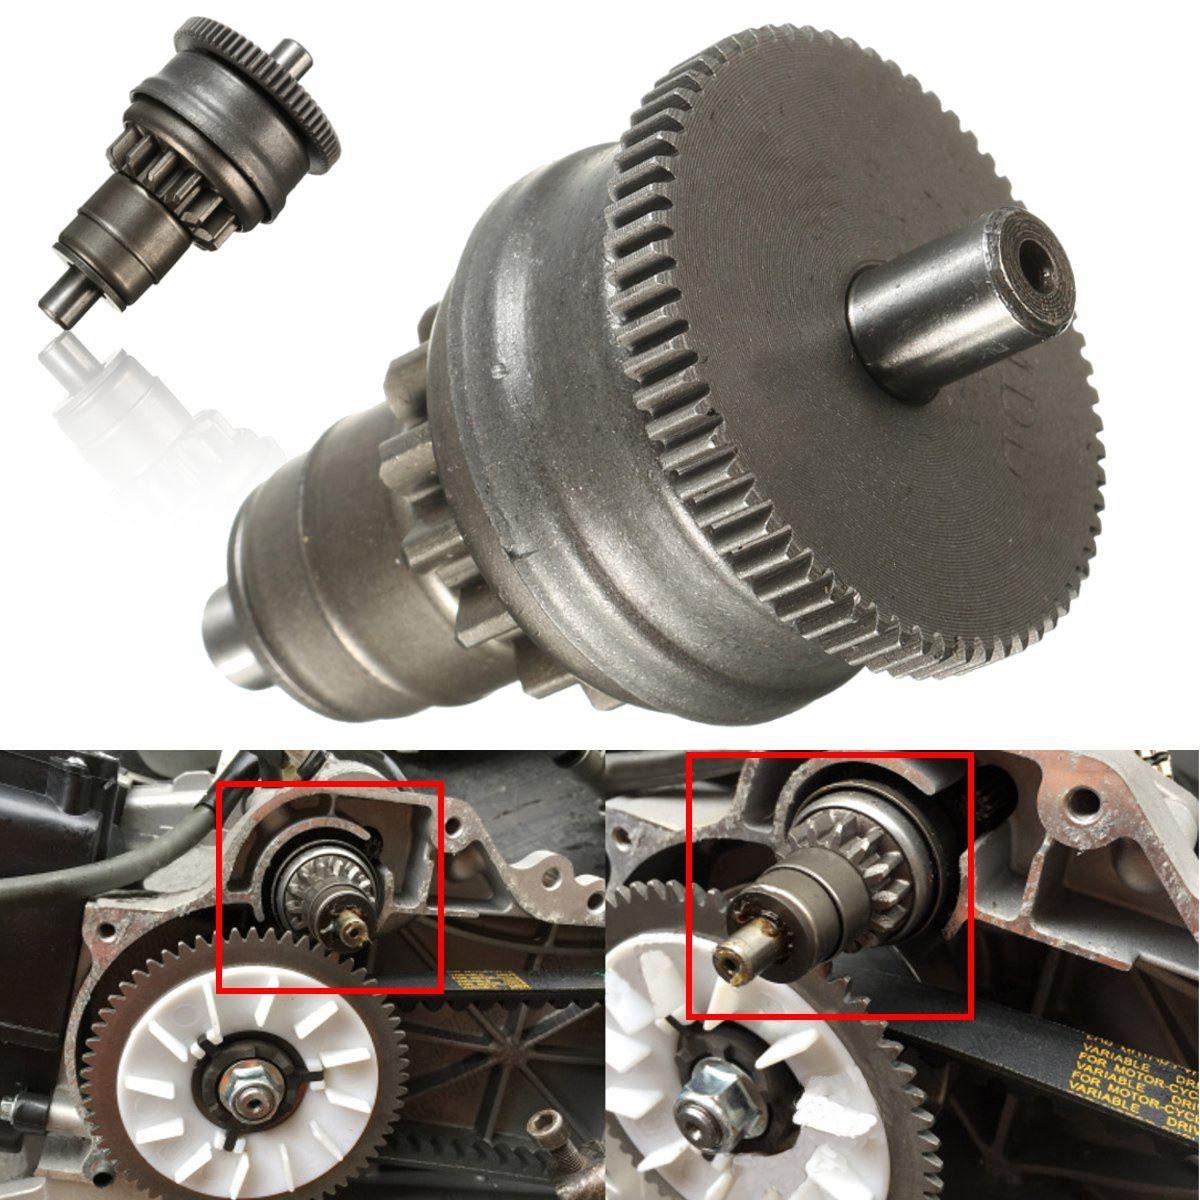 Chrom Starter Motor Kupplung Getriebe Montage Für GY6 49cc 50cc 139QMB Roller Mopeds ATV